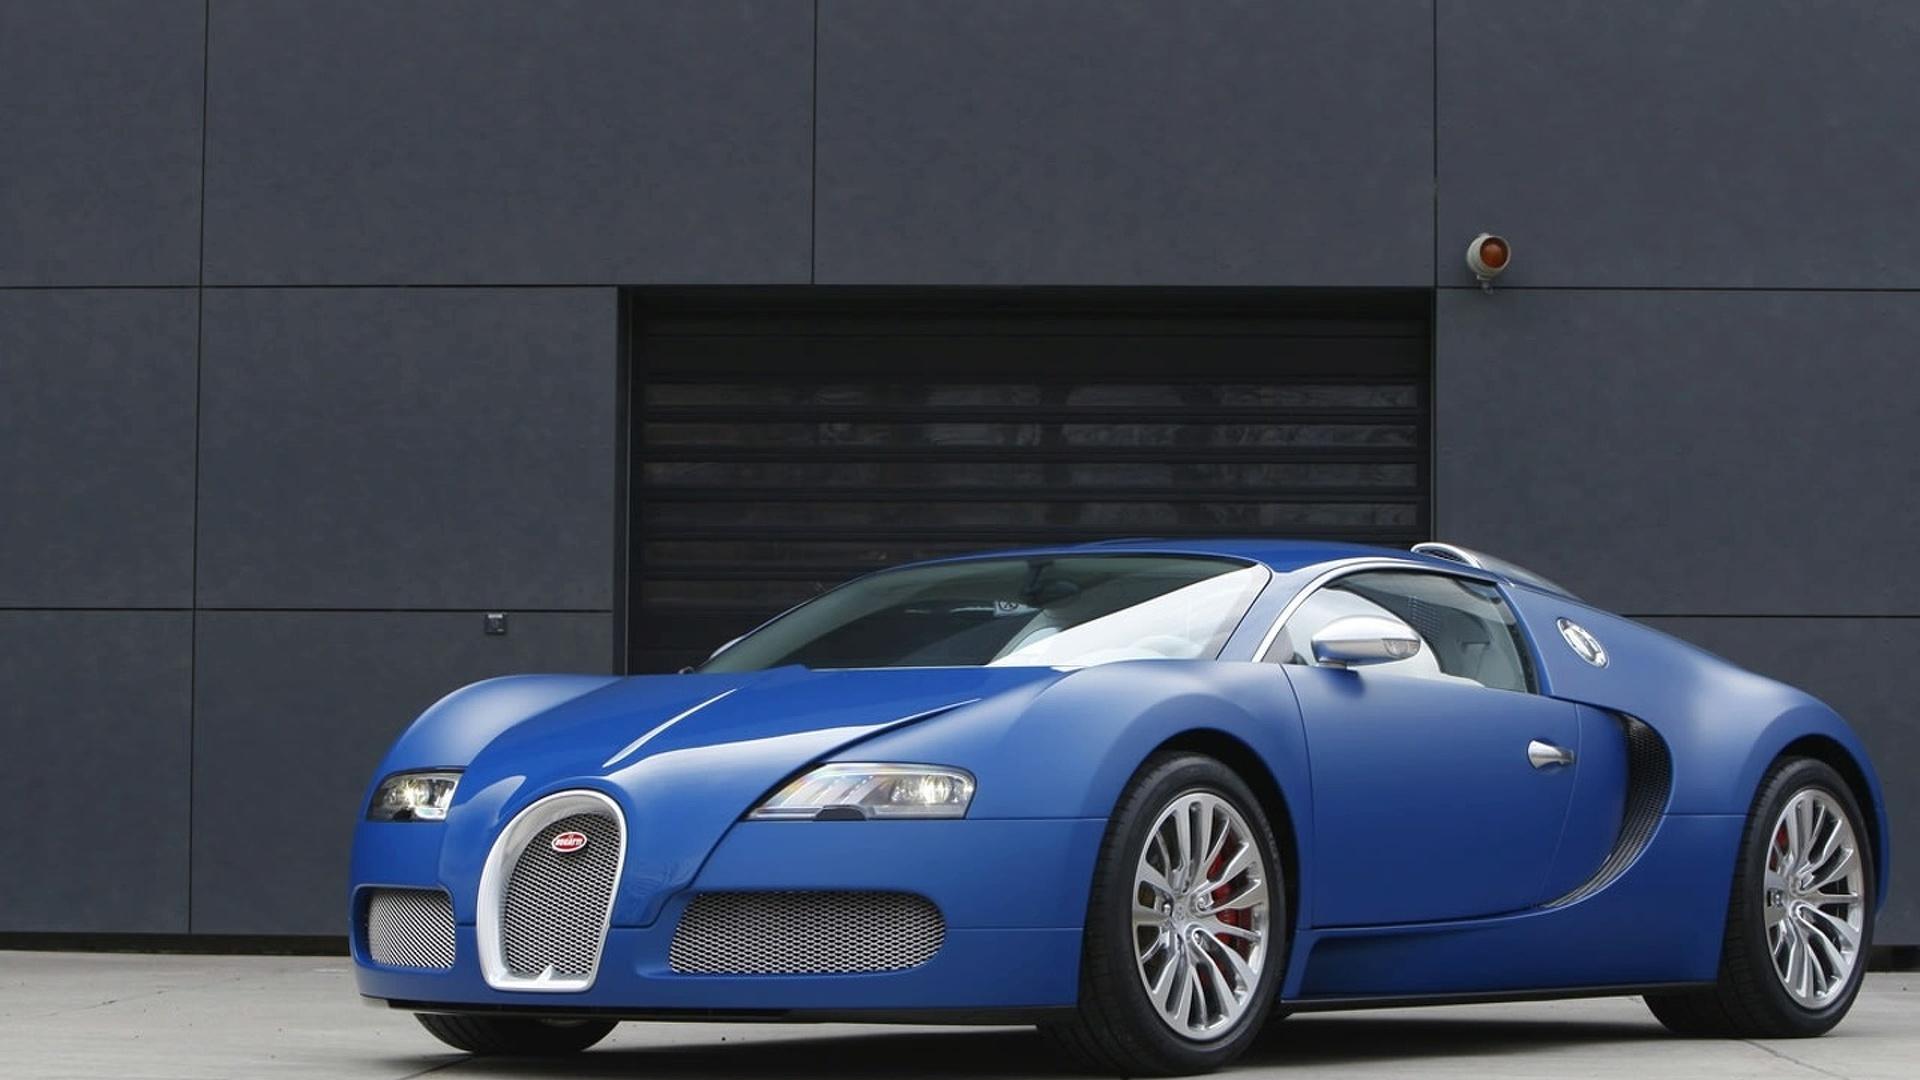 Https www motor1 com news 32377 bugatti veyron successor confirmed to be a hybrid bugatti rumors next generation bugatti veyron next generation veyron